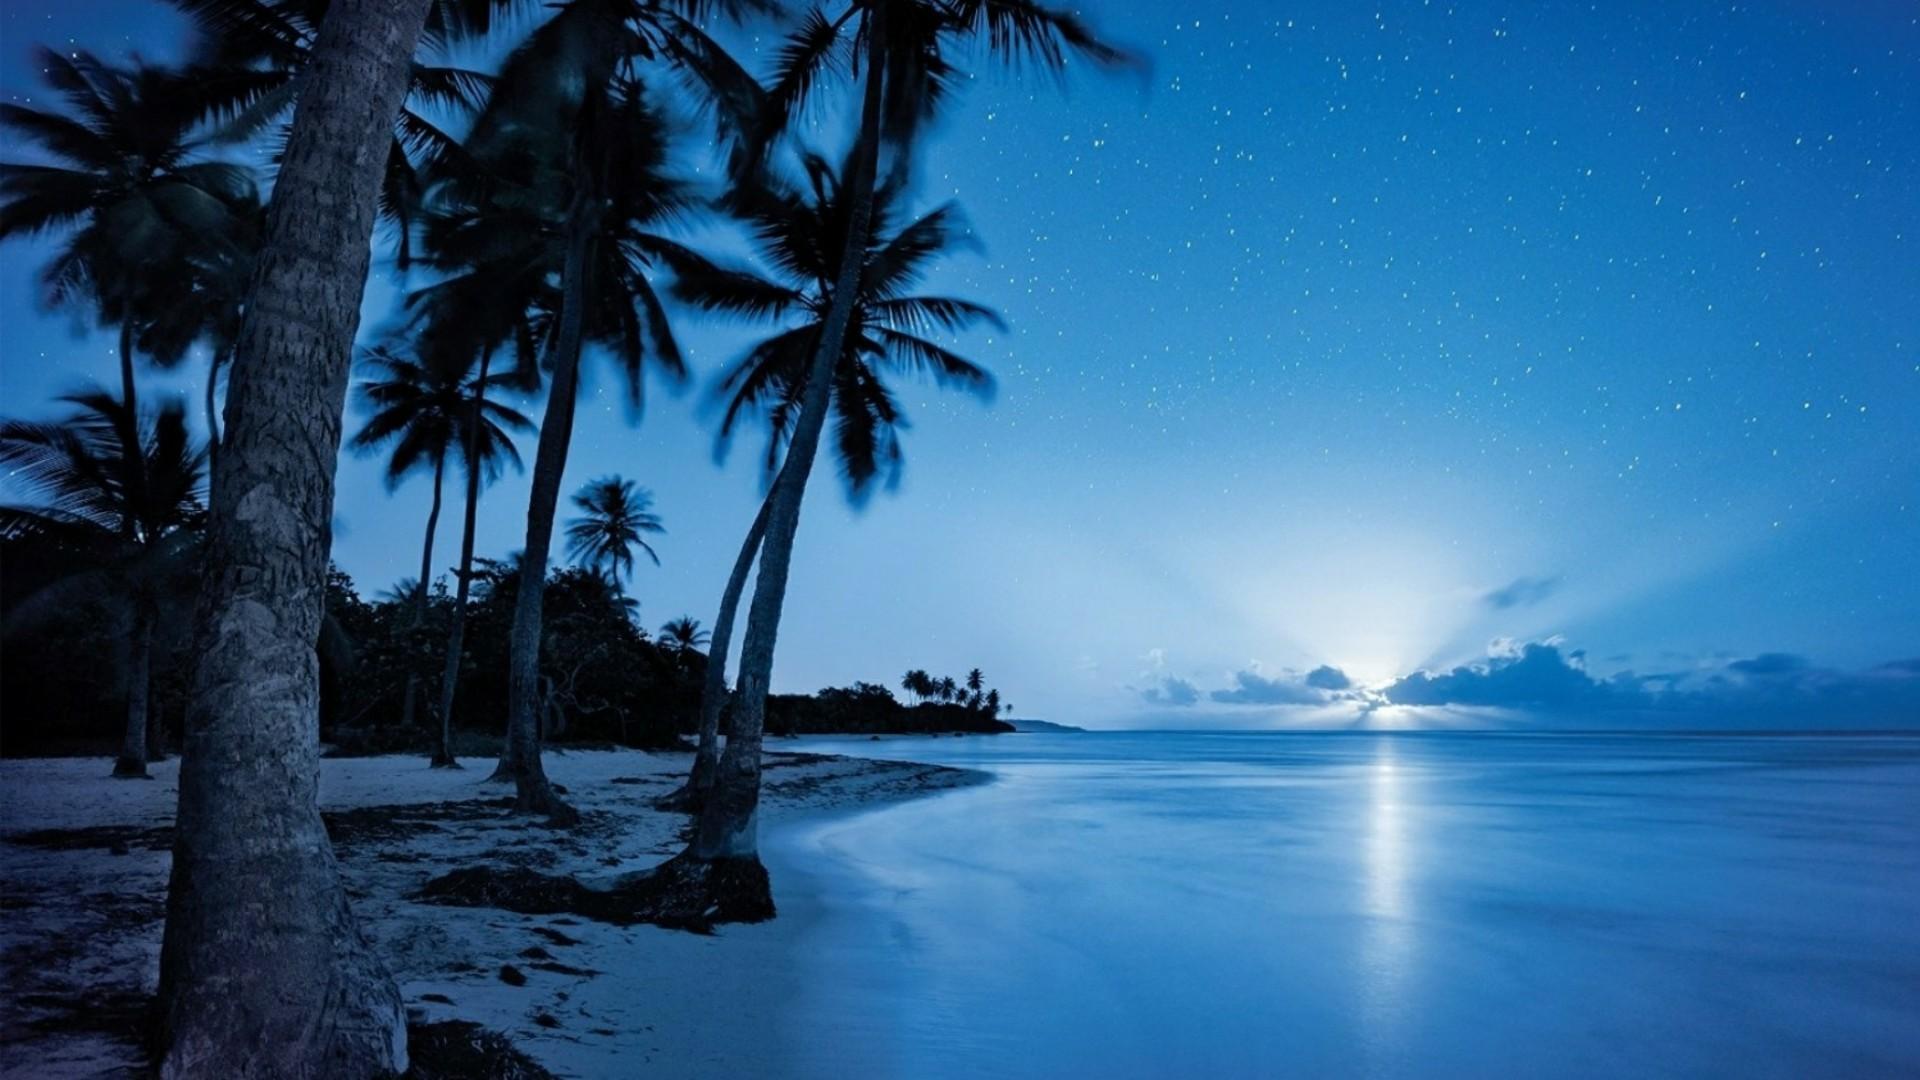 72 Night Ocean Wallpapers on WallpaperPlay 1920x1080